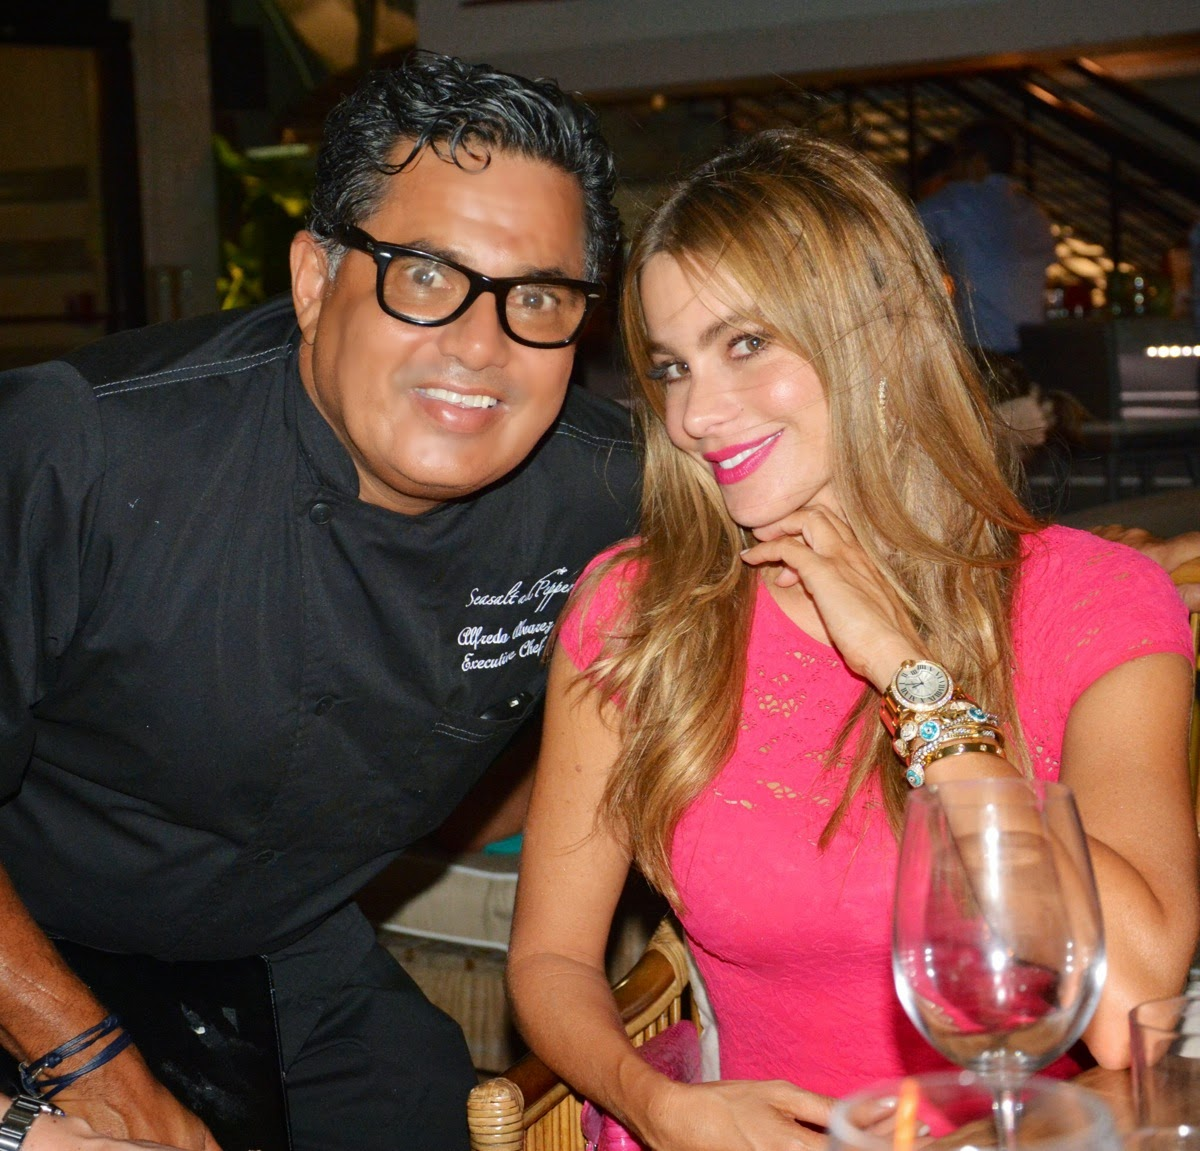 Sofia Vergara and Joe Manganiello Dine Out in Miami